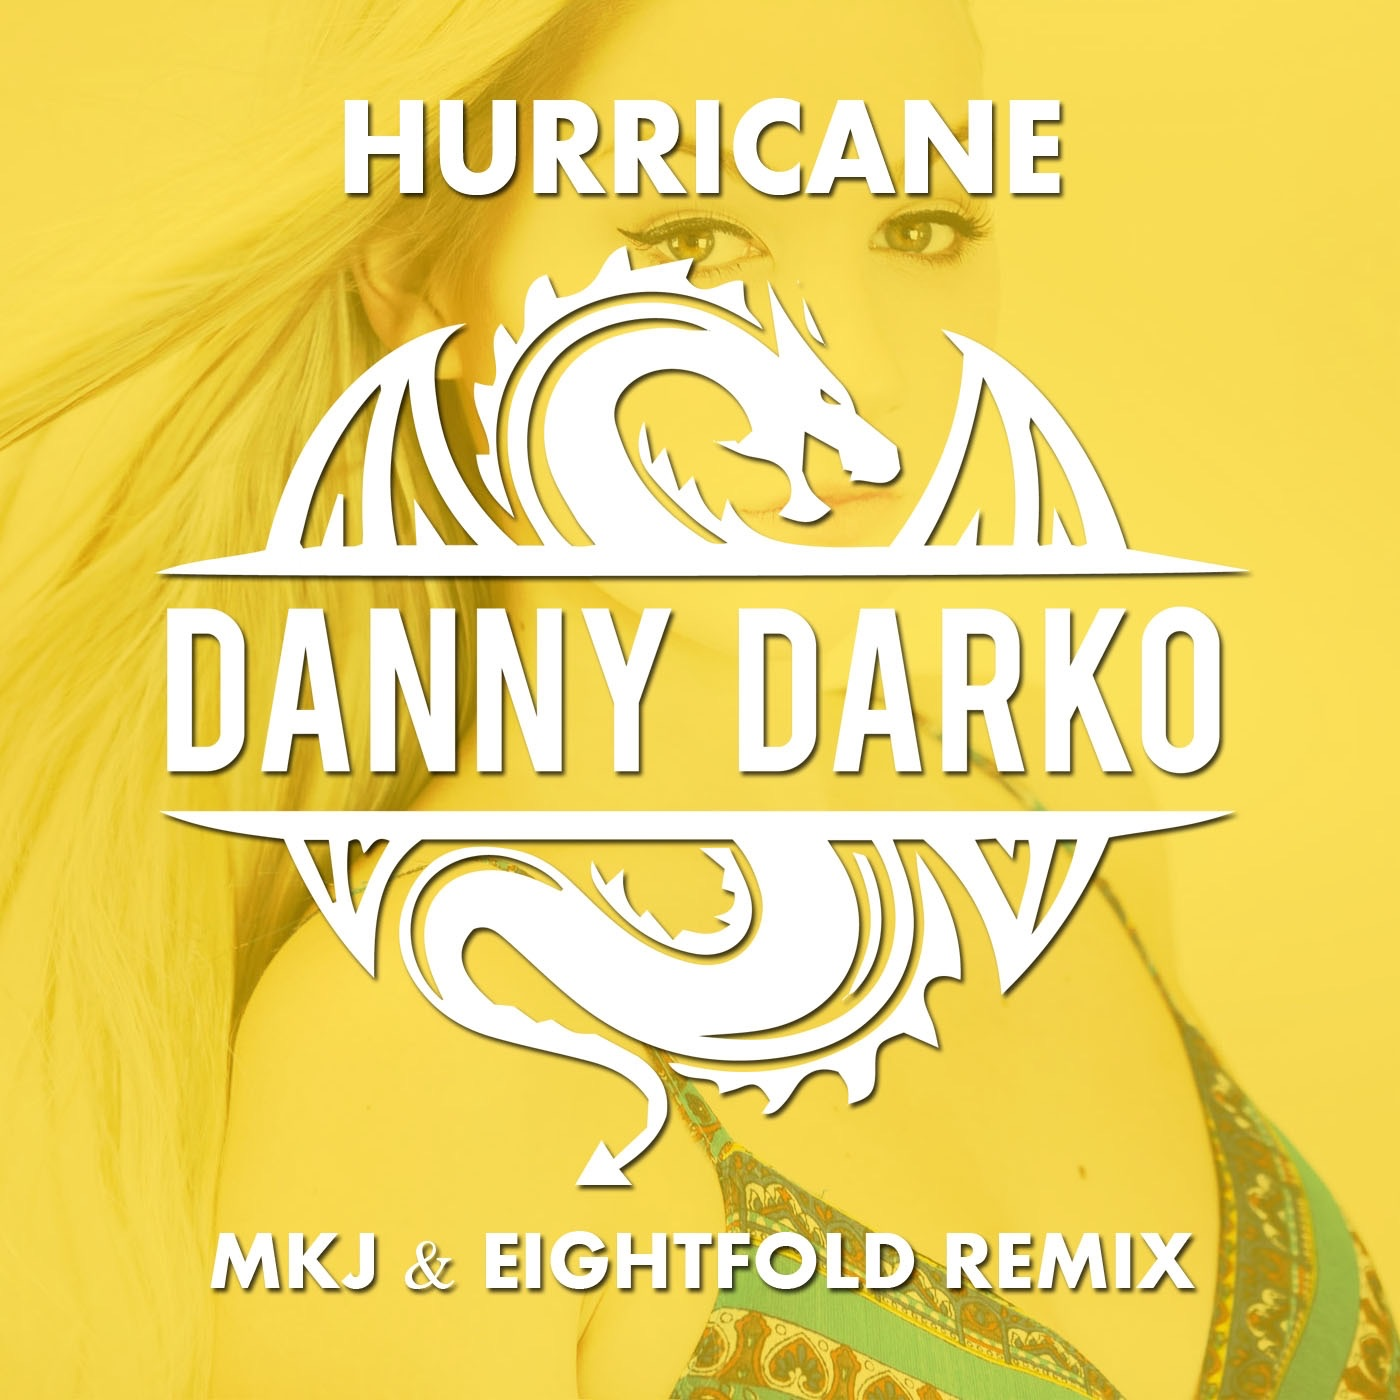 Hurricane (MKJ Eightfold Remix) [feat. Julien Kelland] - Single